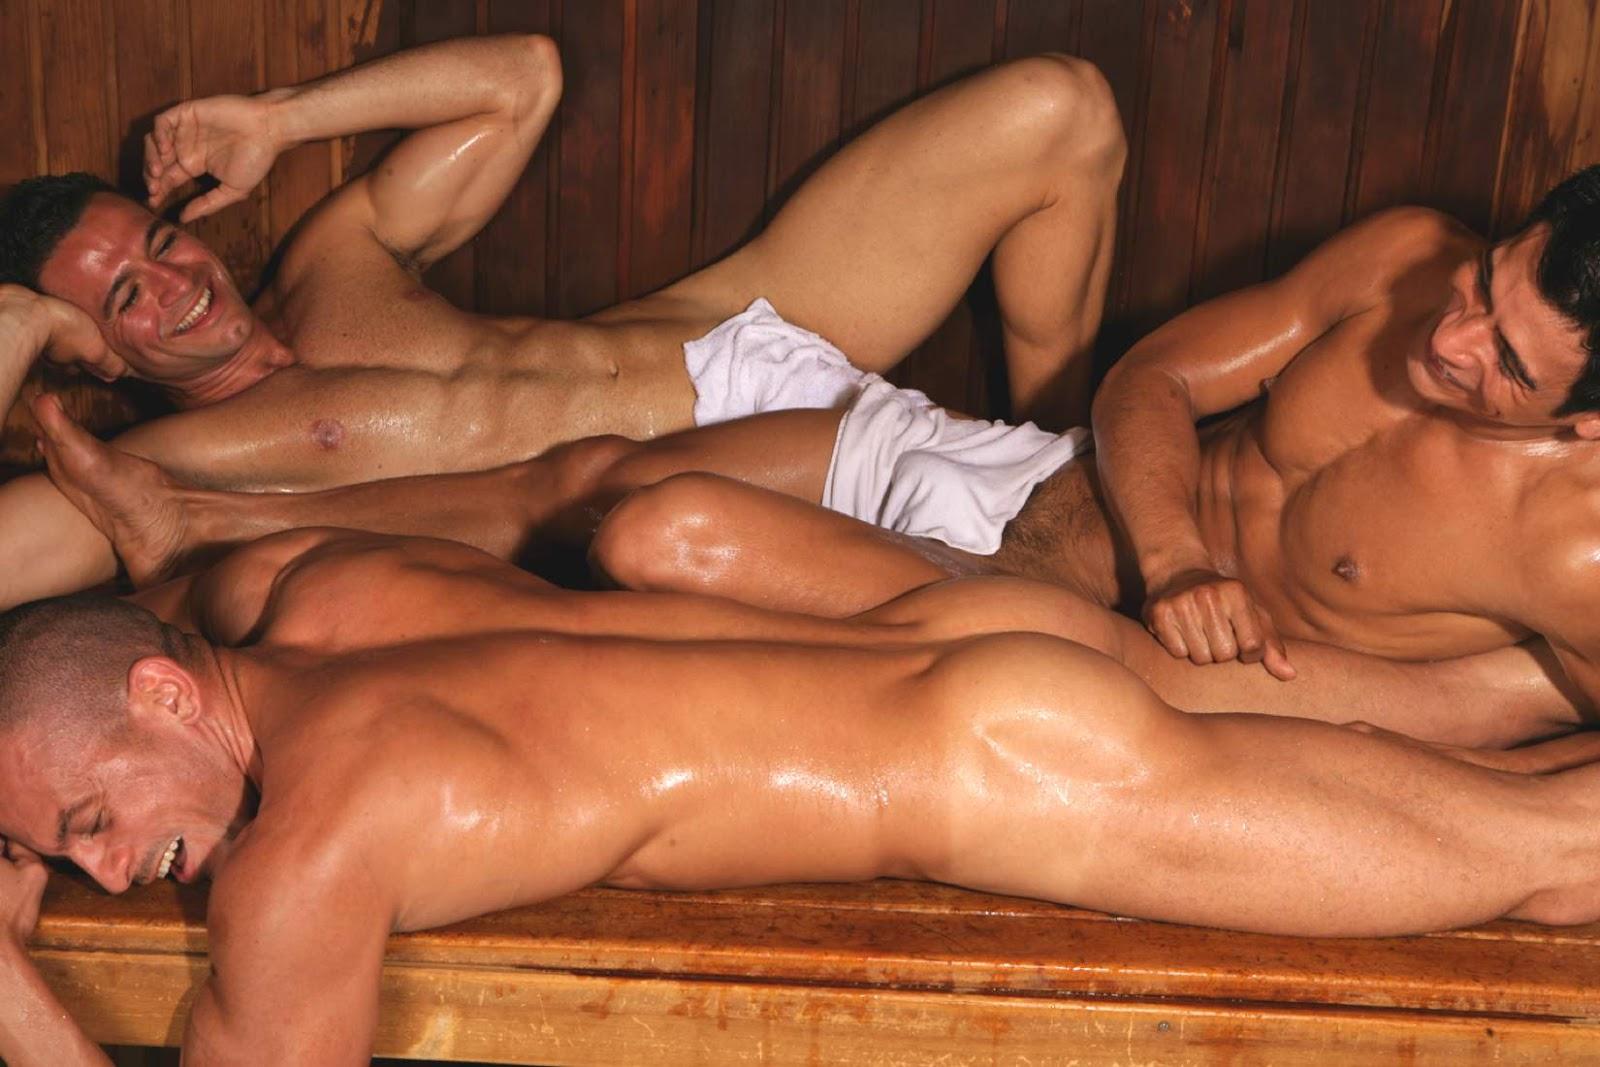 поставил парни голые в бане французской провинции оранж